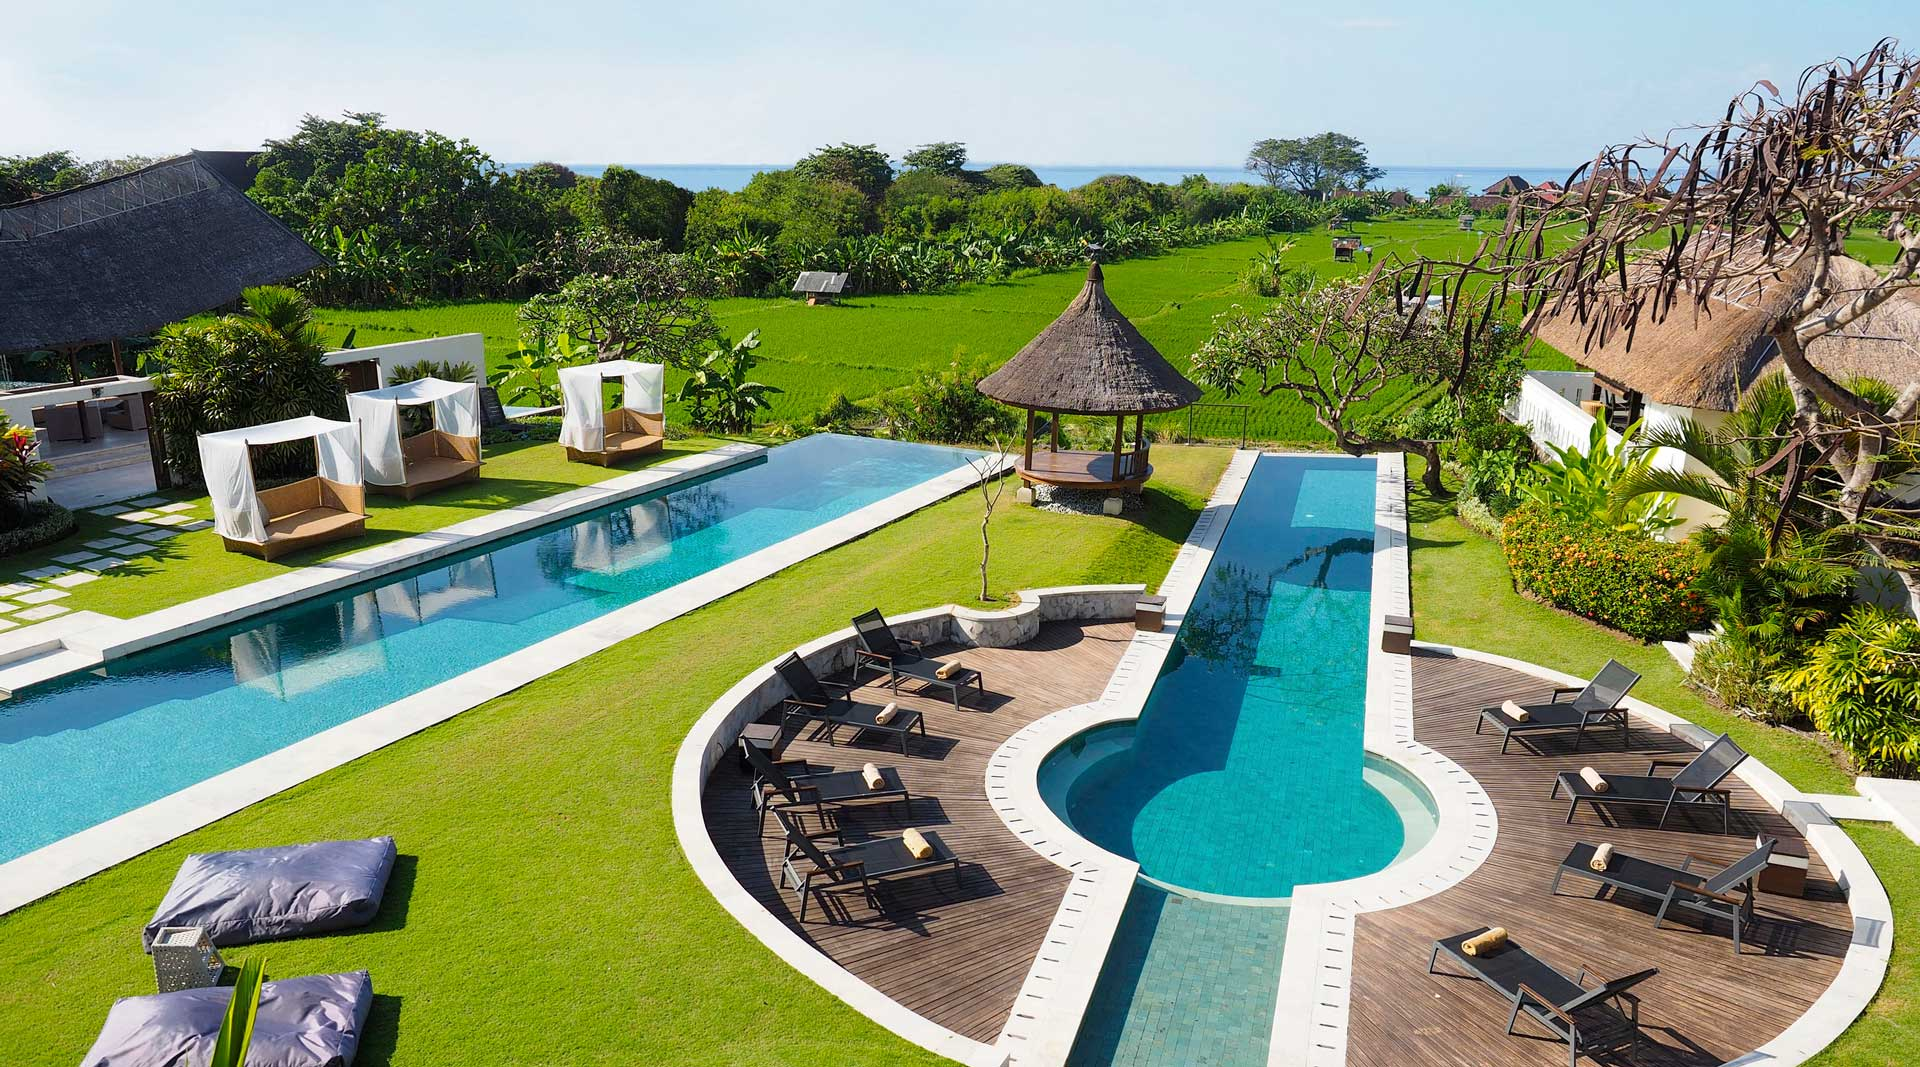 The Samata , Life style retreat - Sanur / Bali